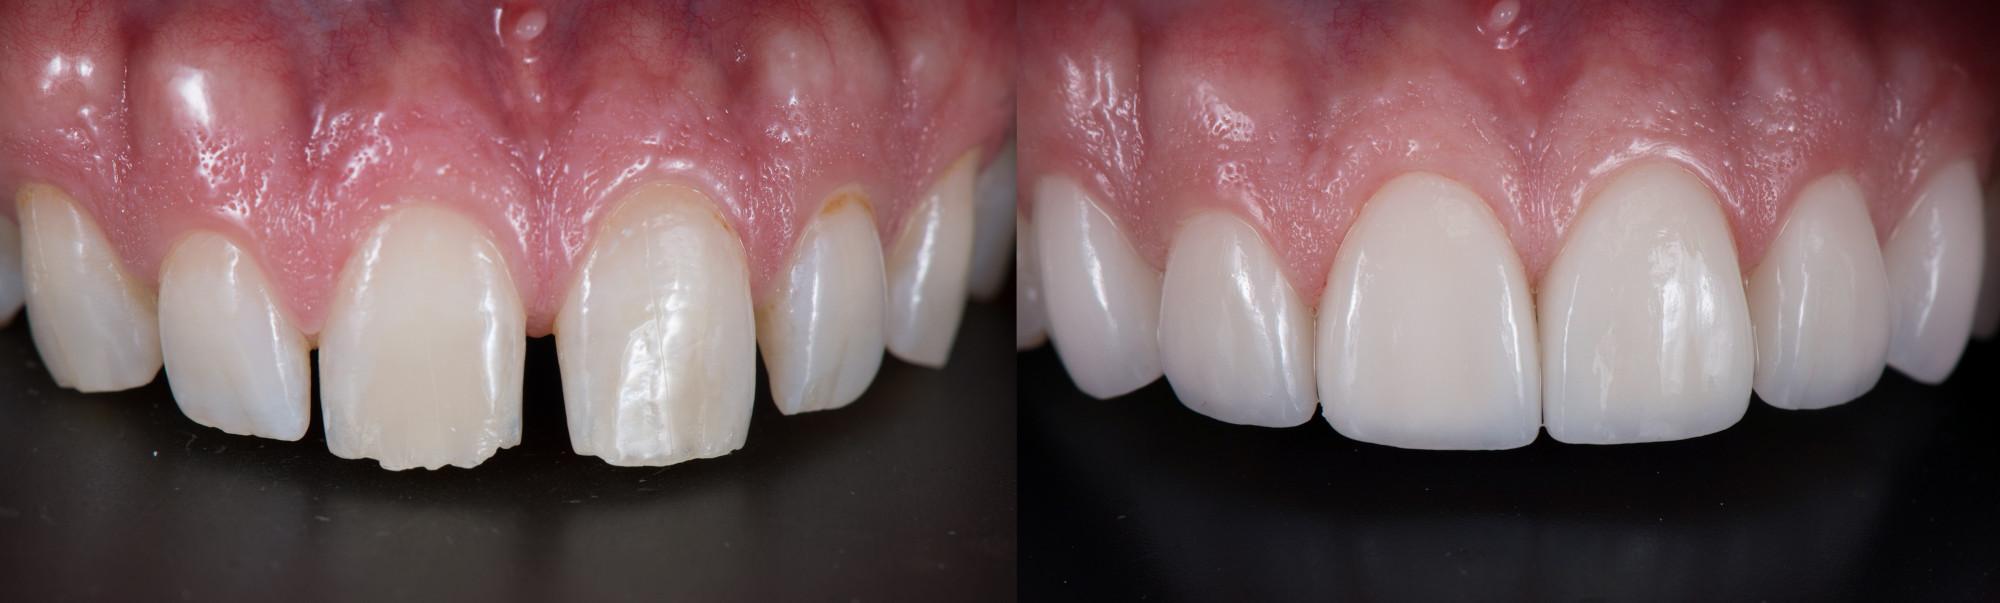 Veneere auf oberen Frontzähnen